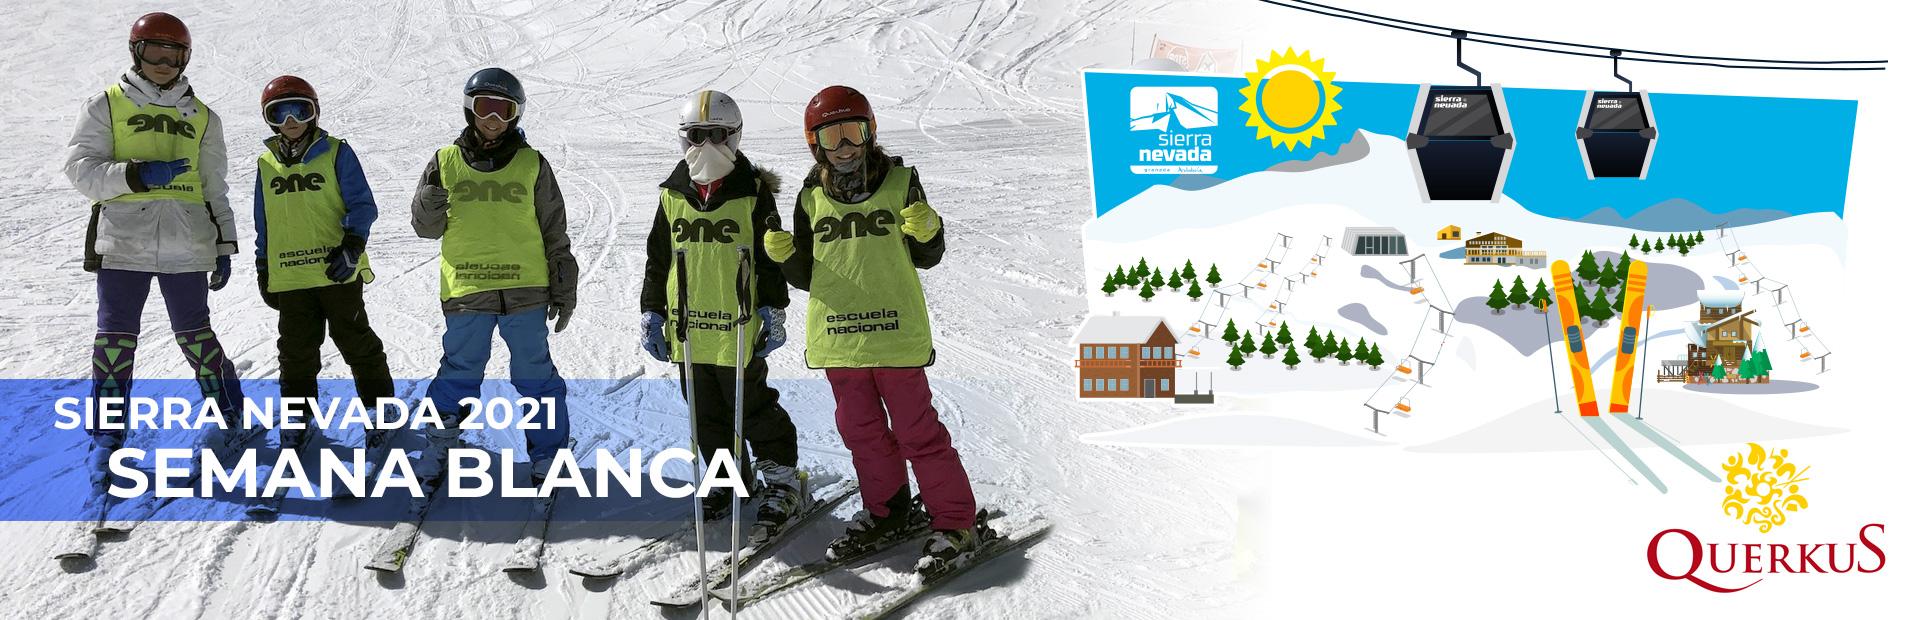 Semana Blanca 2022 Sierra Nevada